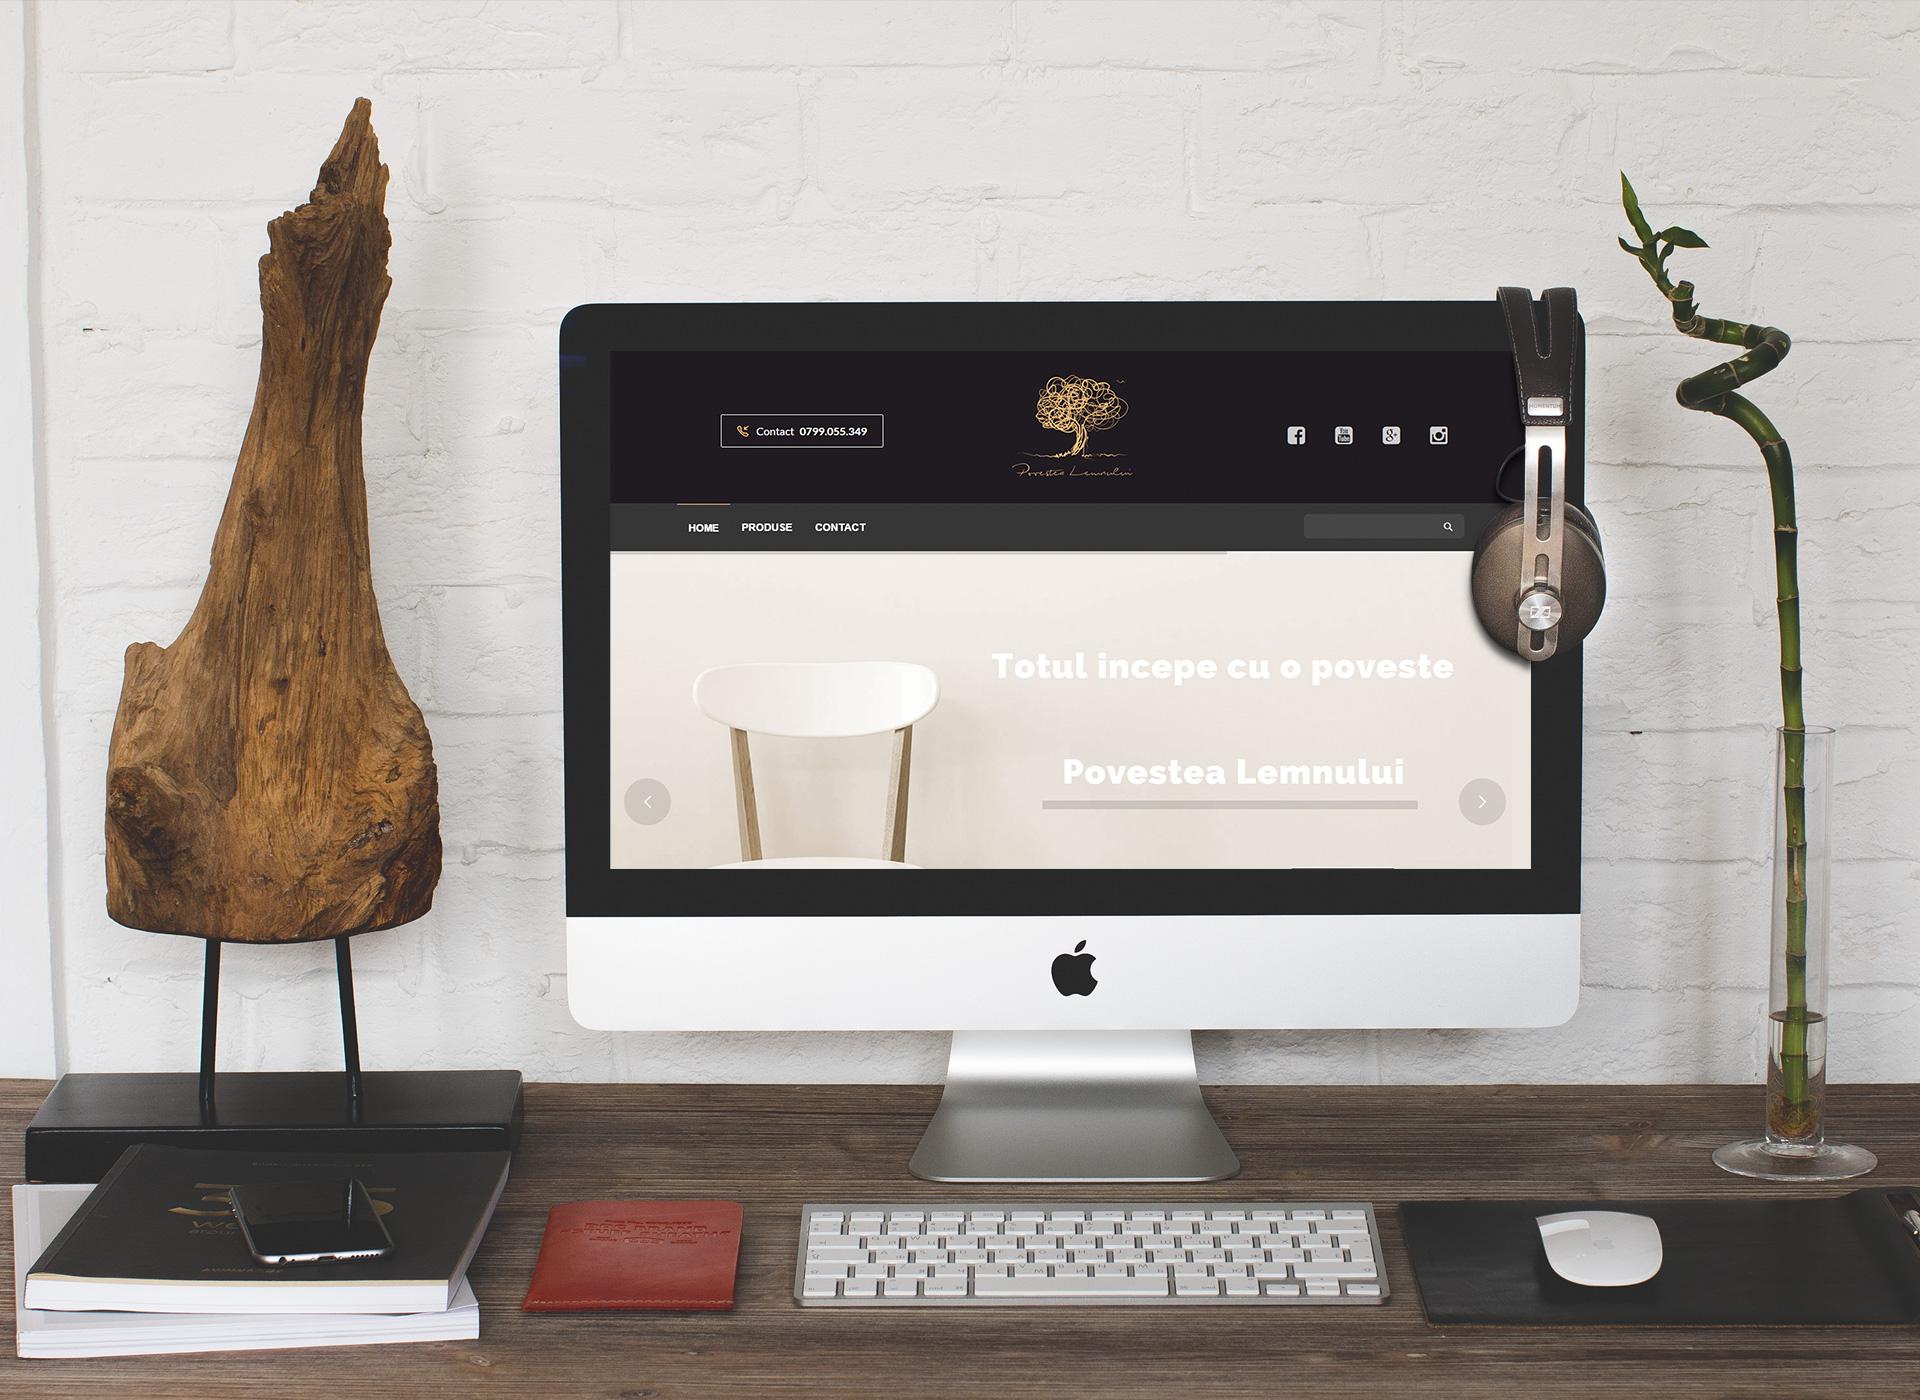 Povestea Lemnului Portfolio Inoveo website